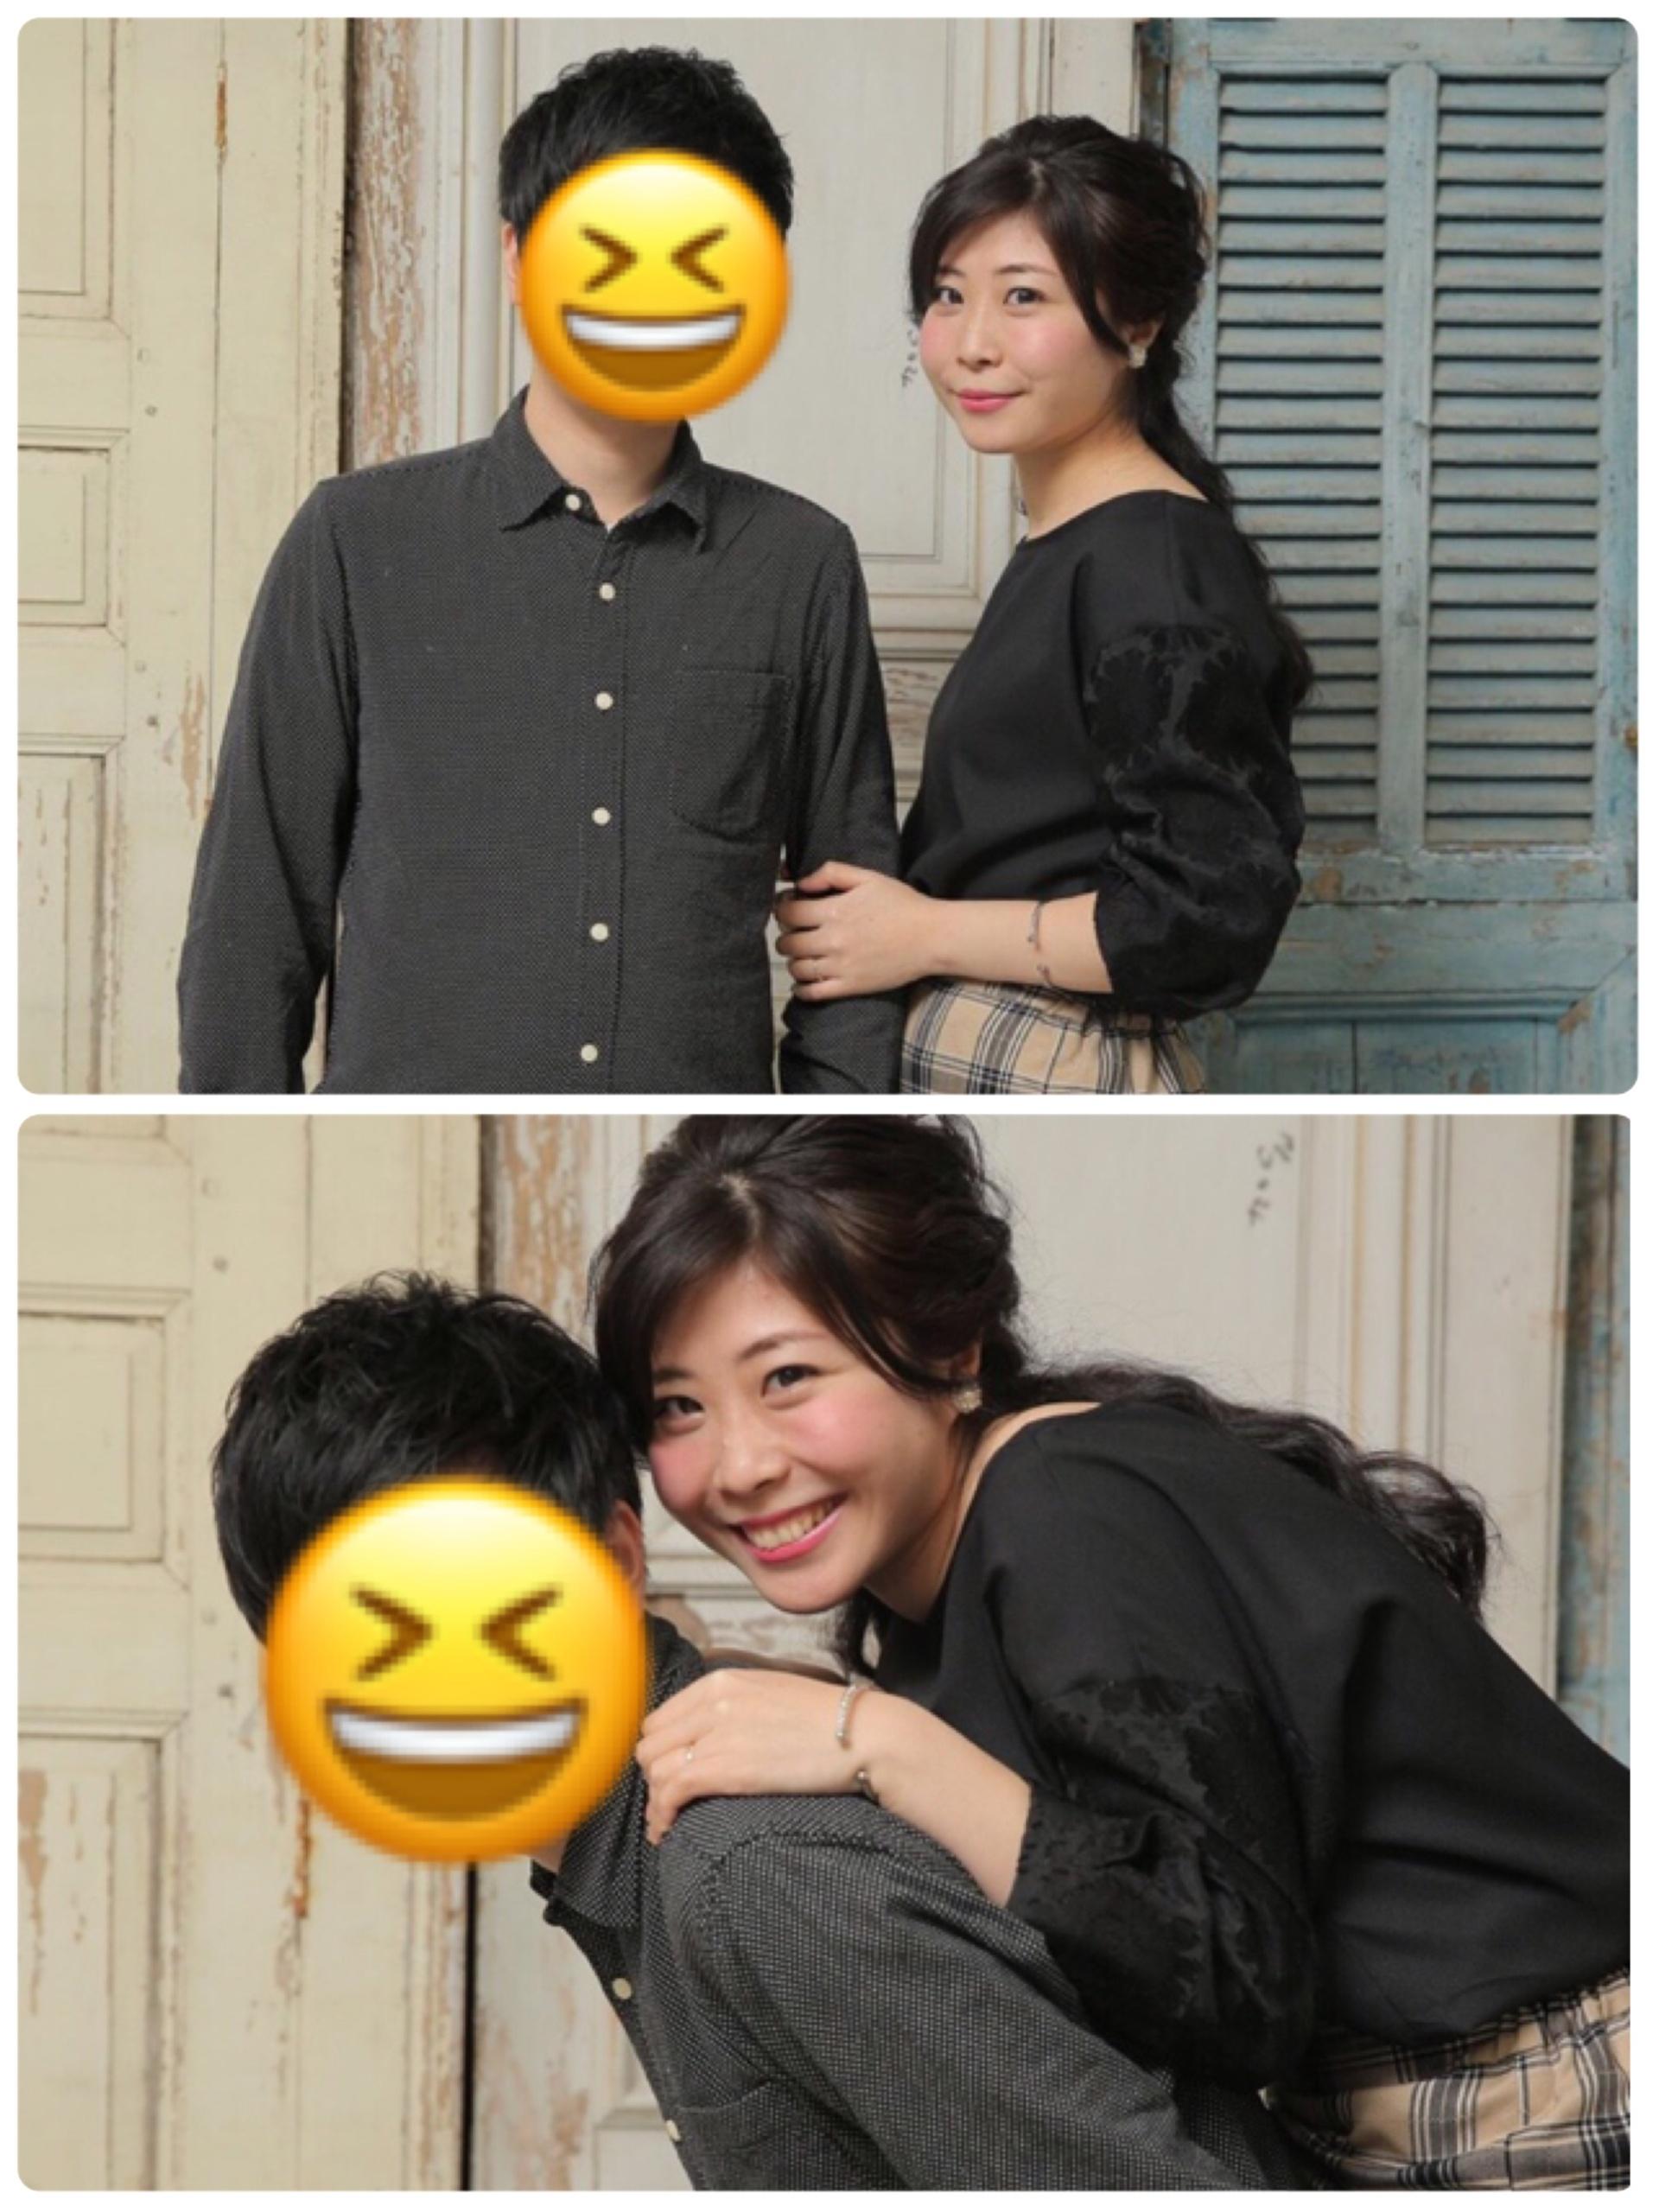 【wedding photo shower参加レポート★】私たち、結婚写真の重要性について考えてみました。_1_4